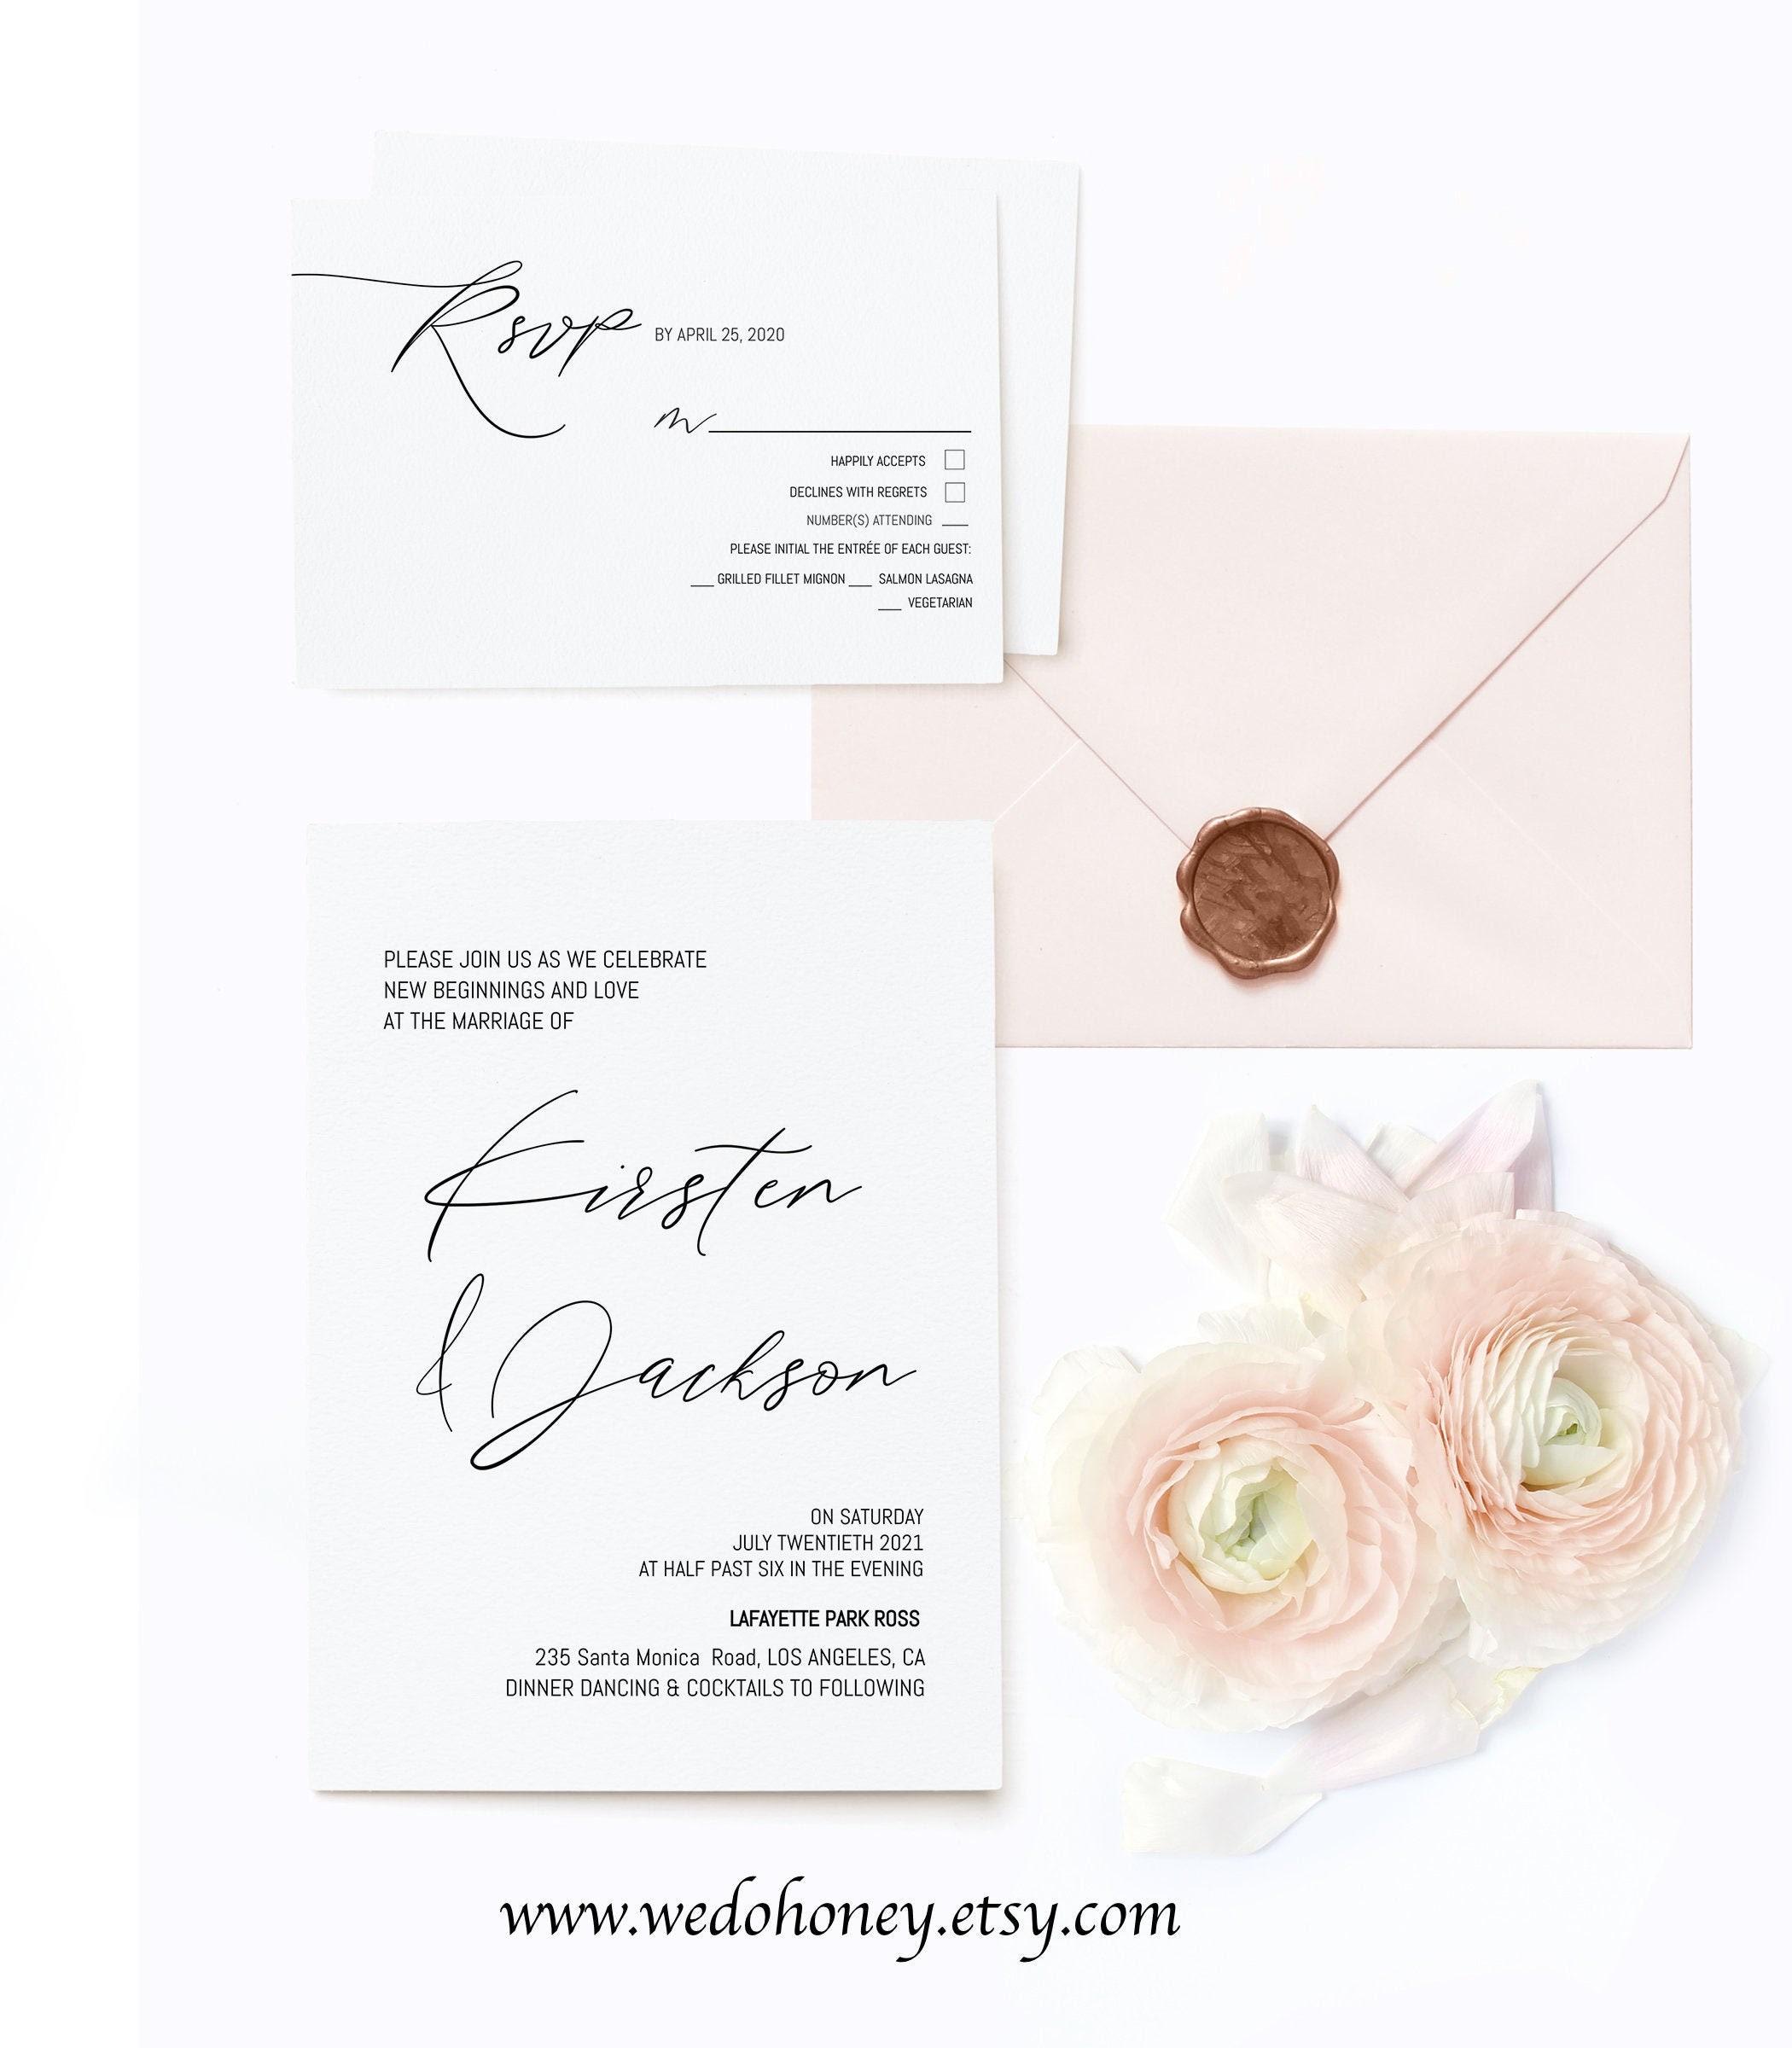 Minimalist Wedding Invitation Set Template, Fully Editable Text, Modern and Simple, Invitation 5x7'', RSVP 4x6'' and 5x3.5''